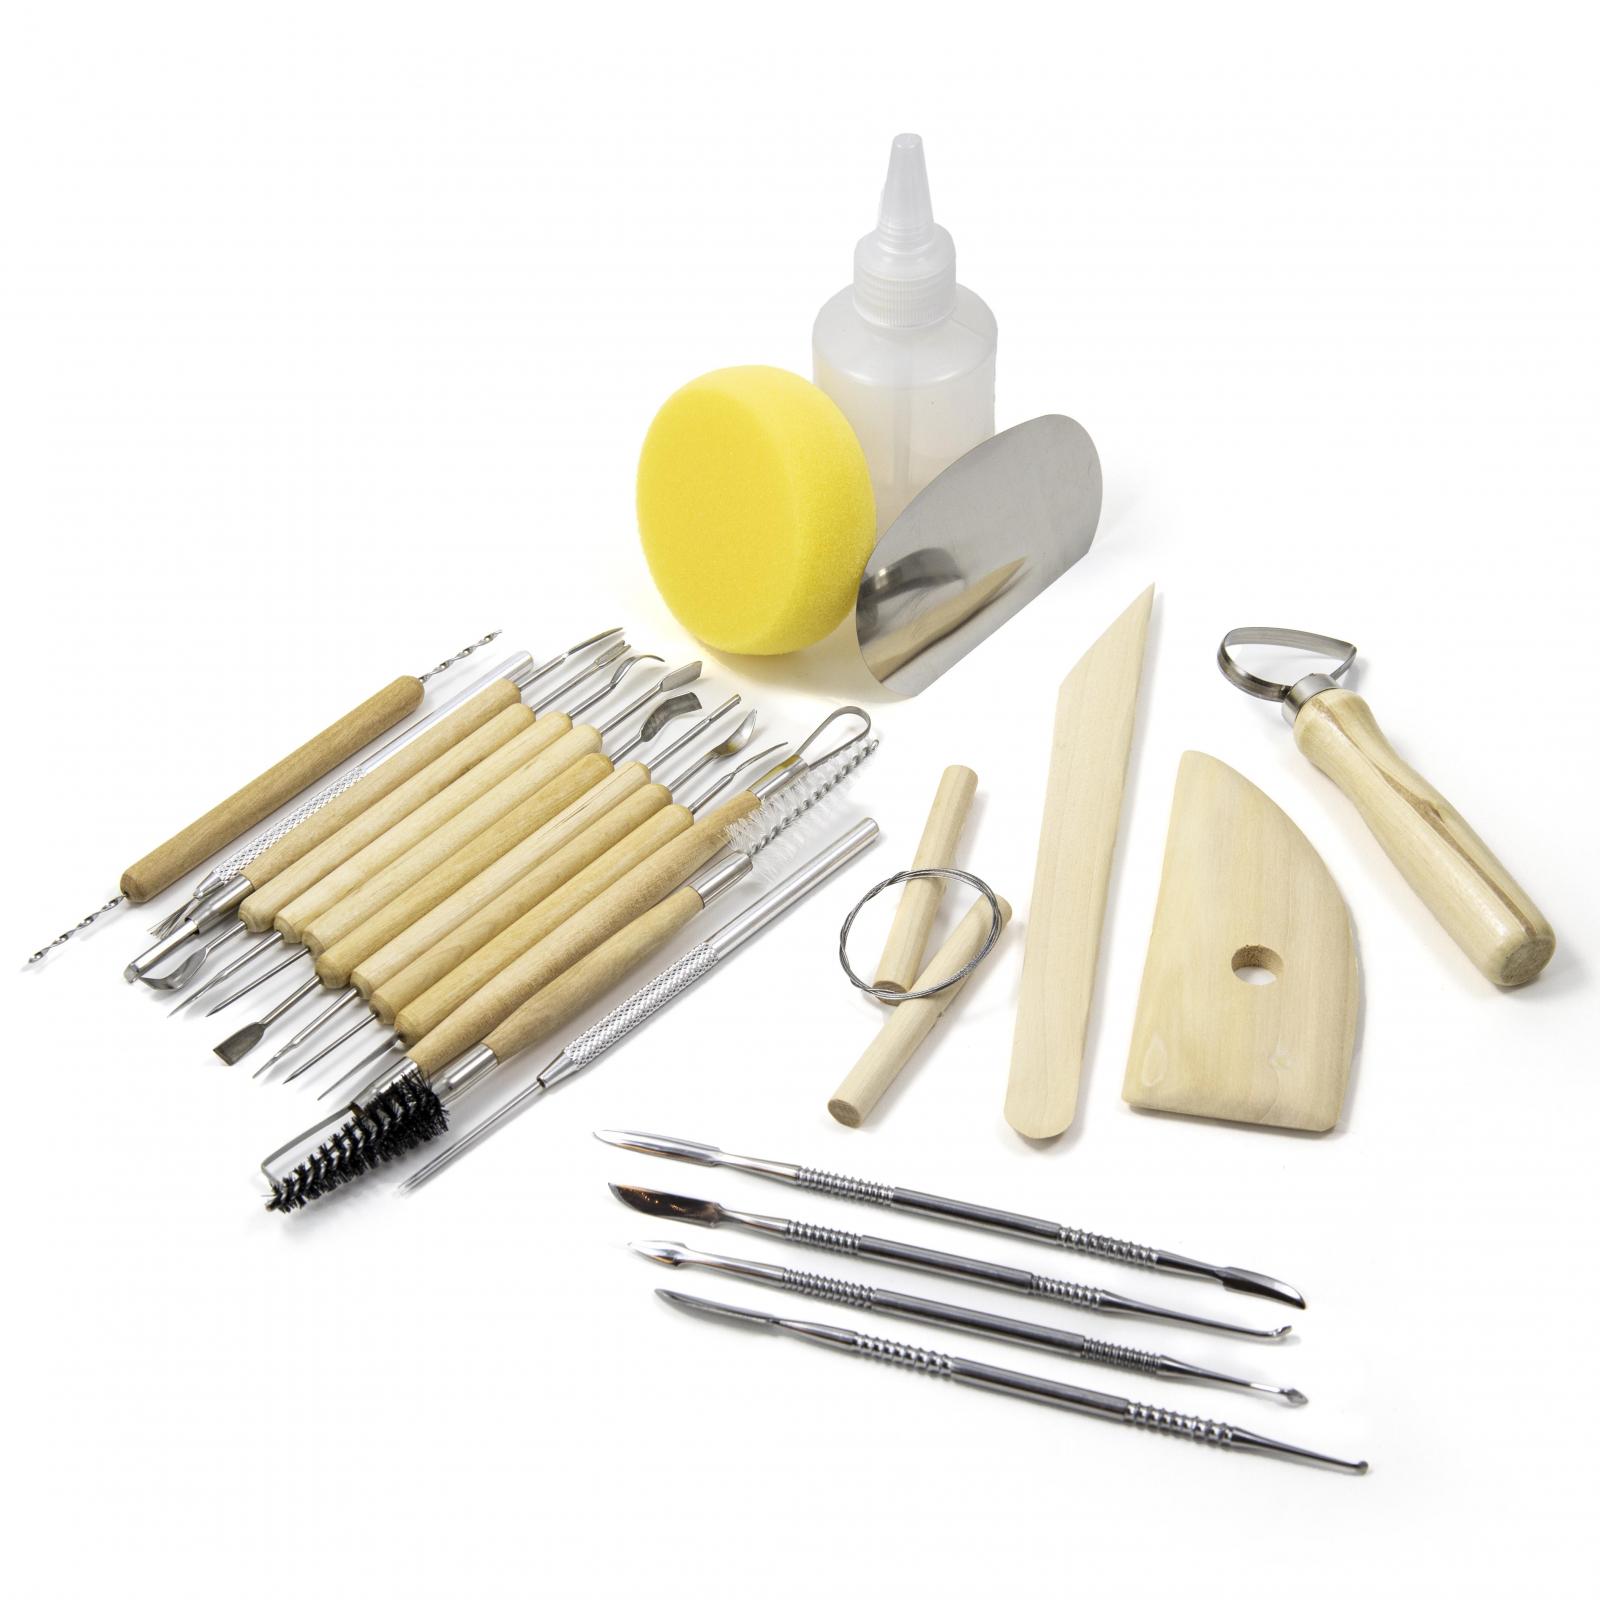 ToolTreaux Beginner Pottery Sculpting Art Supplies Tools Kit